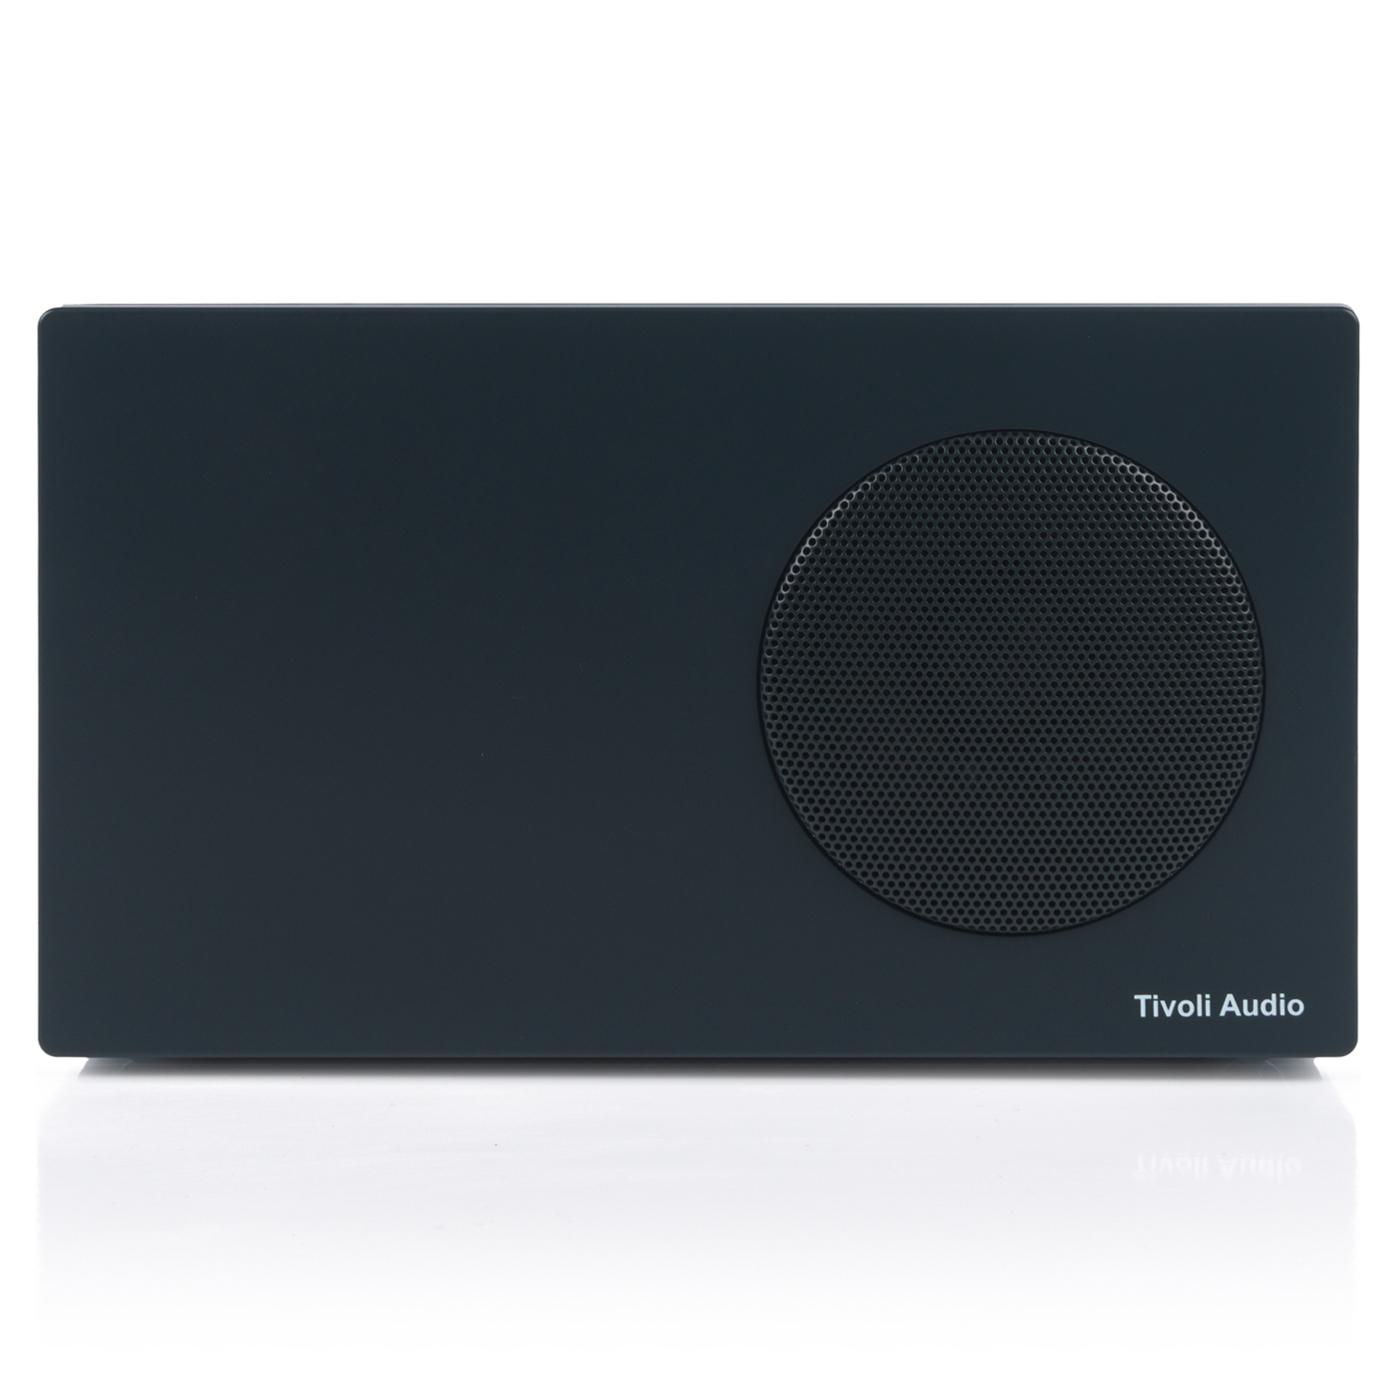 Tivoli Audio Albergo Stereo Speaker For Albergo Bluetooth Clock Radio by Tivoli Audio